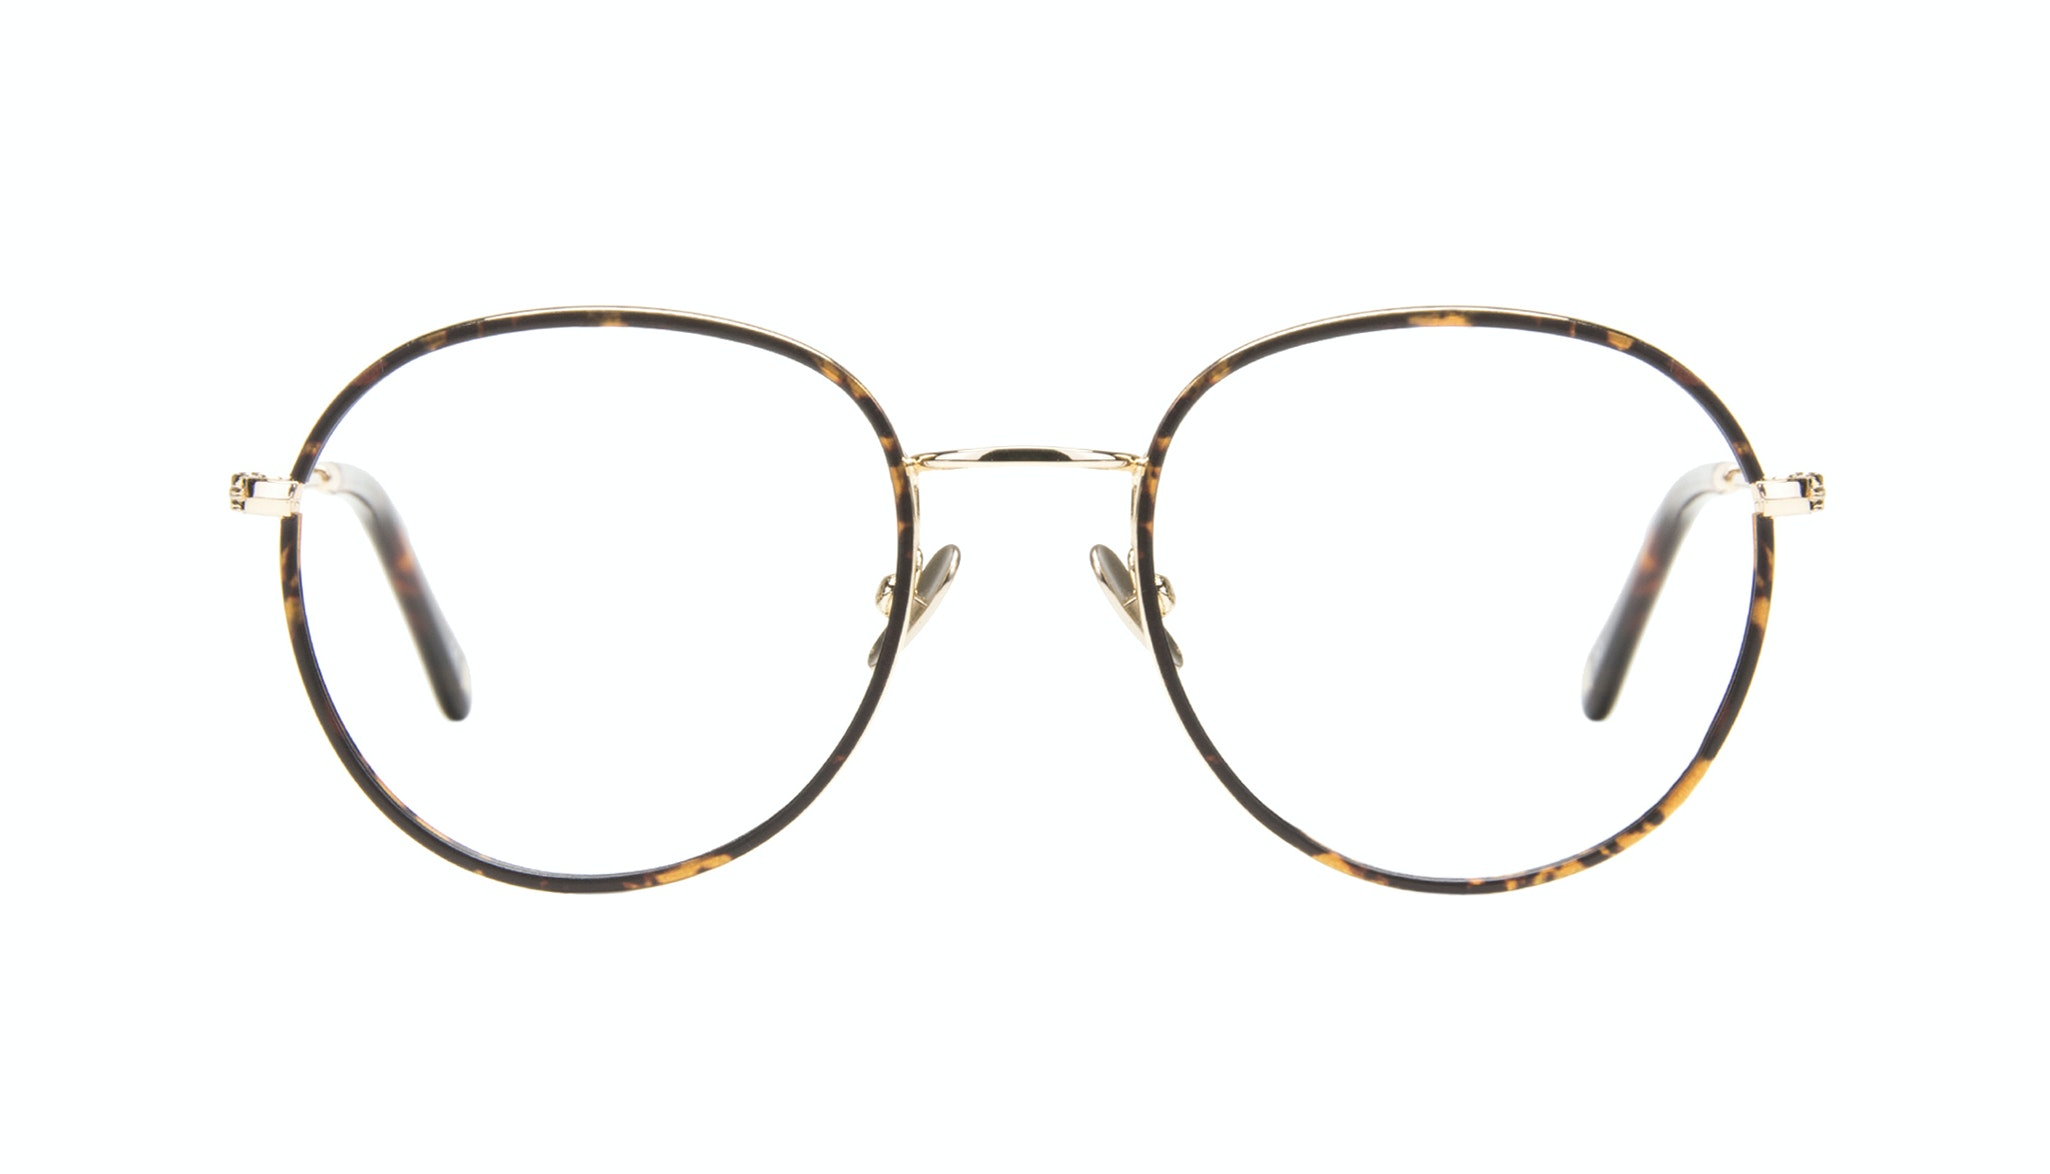 Affordable Fashion Glasses Aviator Round Eyeglasses Women Subrosa Fauve Front